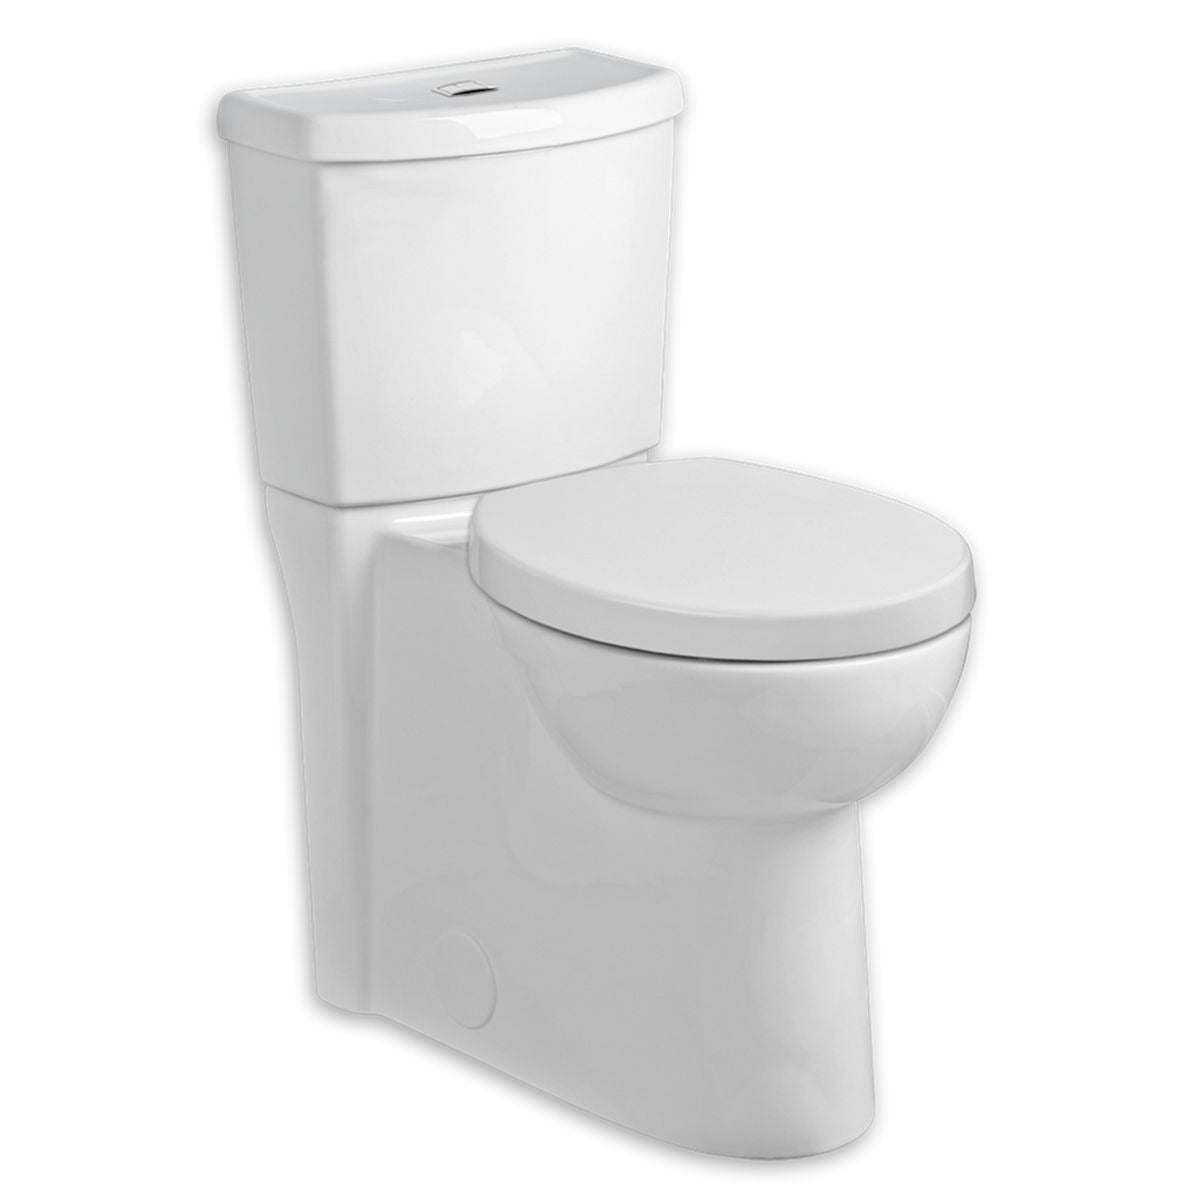 Astounding American Standard Studio Elongated Dual Flush Right Height Two Piece Toilet 2794 204 020 White Uwap Interior Chair Design Uwaporg